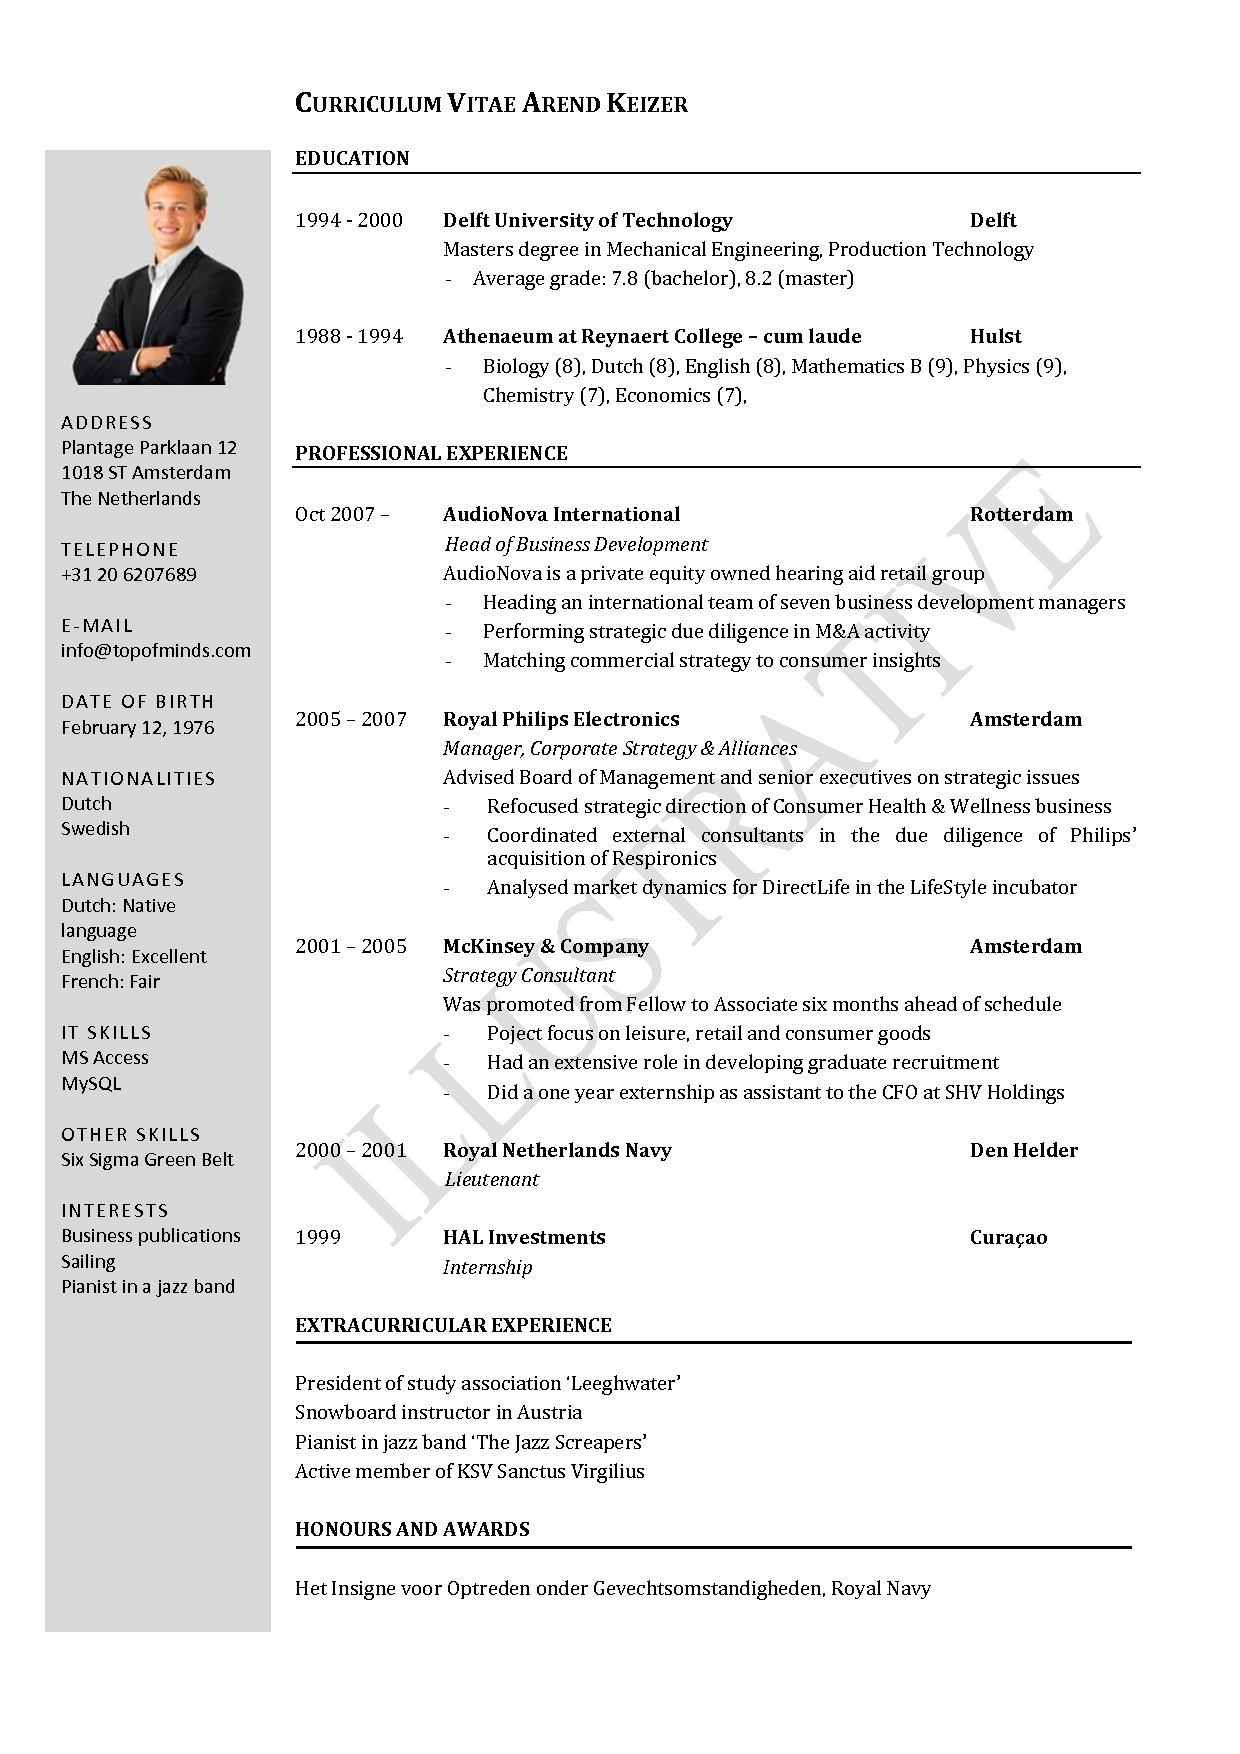 cv template university student google search - University Student Resume Template